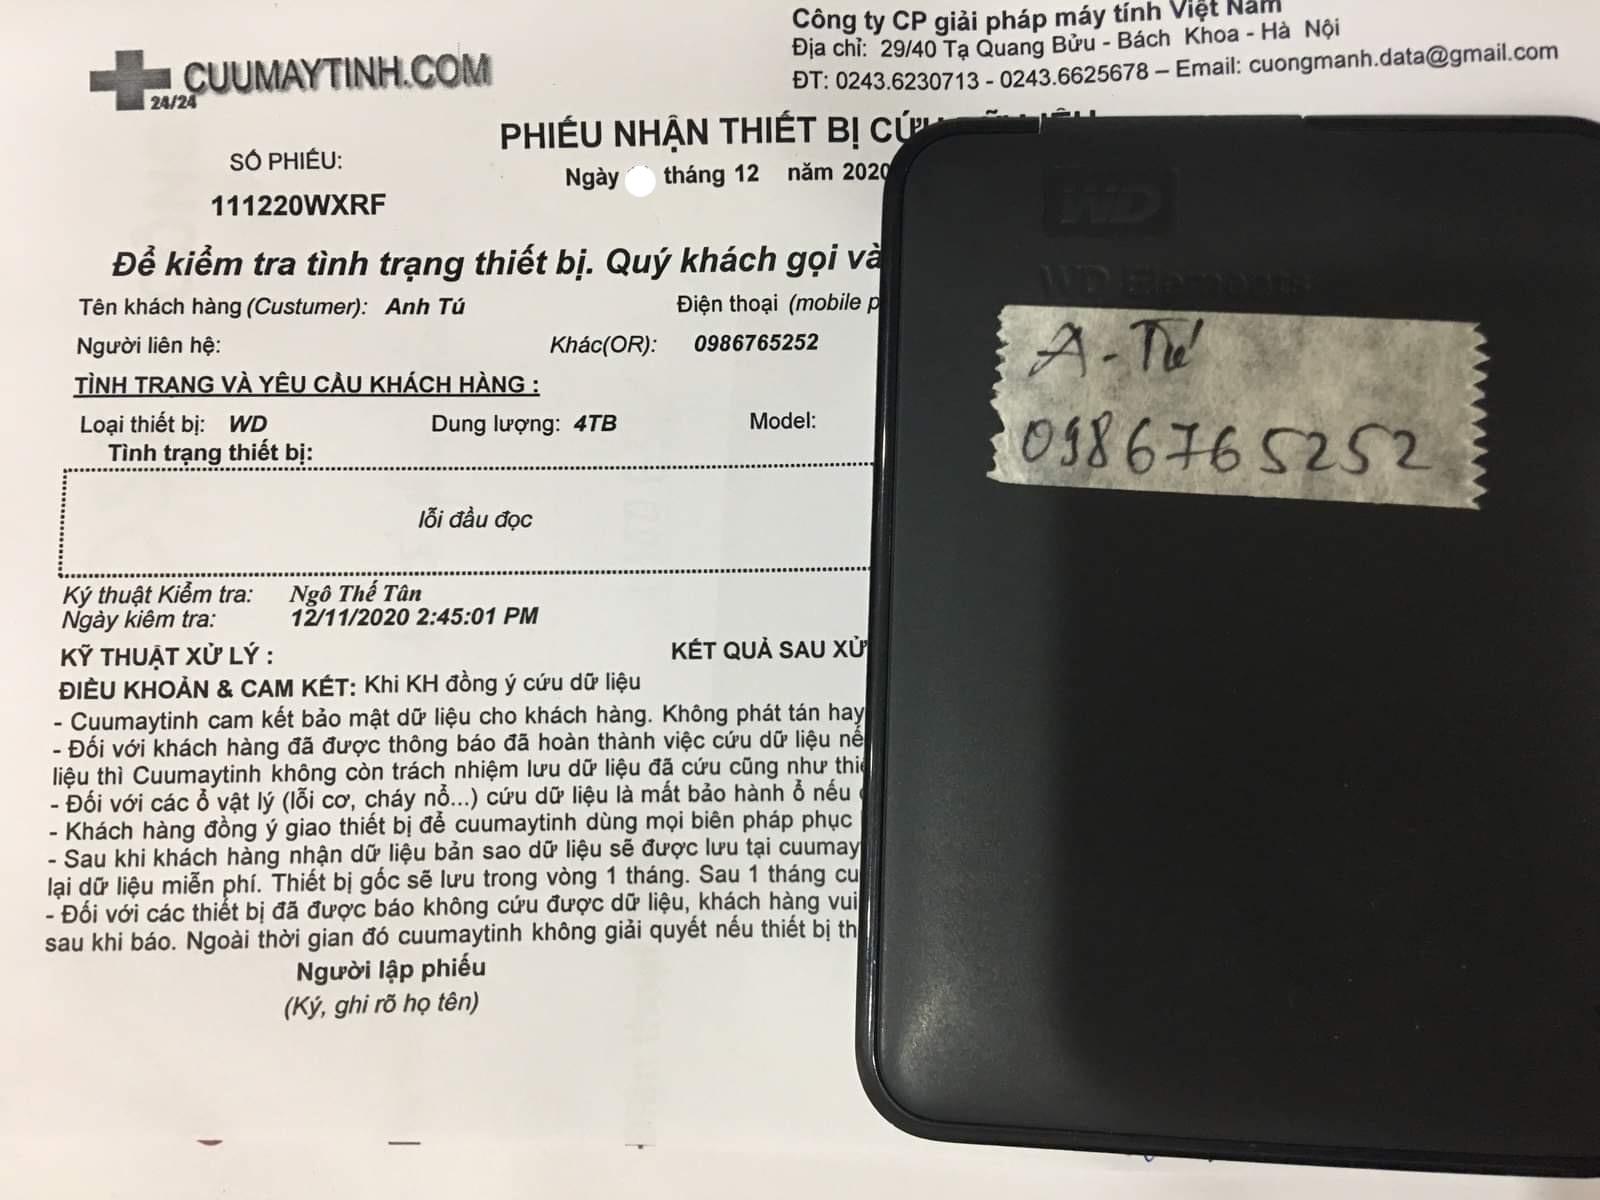 Cứu dữ liệu ổ cứng Western 4TB lỗi cơ - 29/12/2020 - cuumaytinh